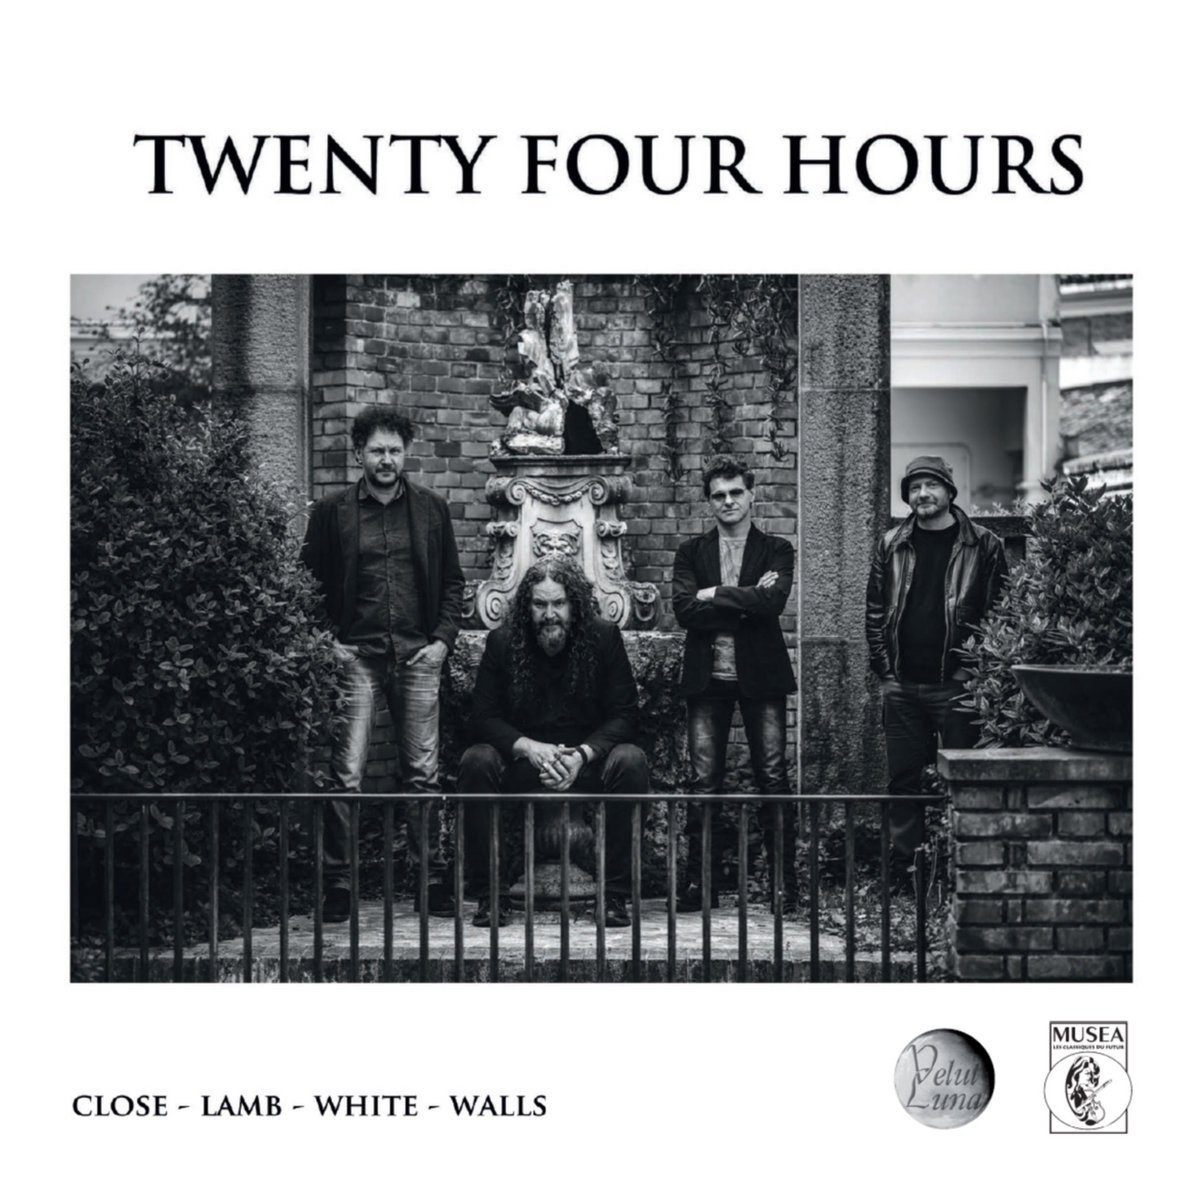 CLOSE - LAMB - WHITE - WALLS (Double Album) Master 88KHz/24 bit FLAC